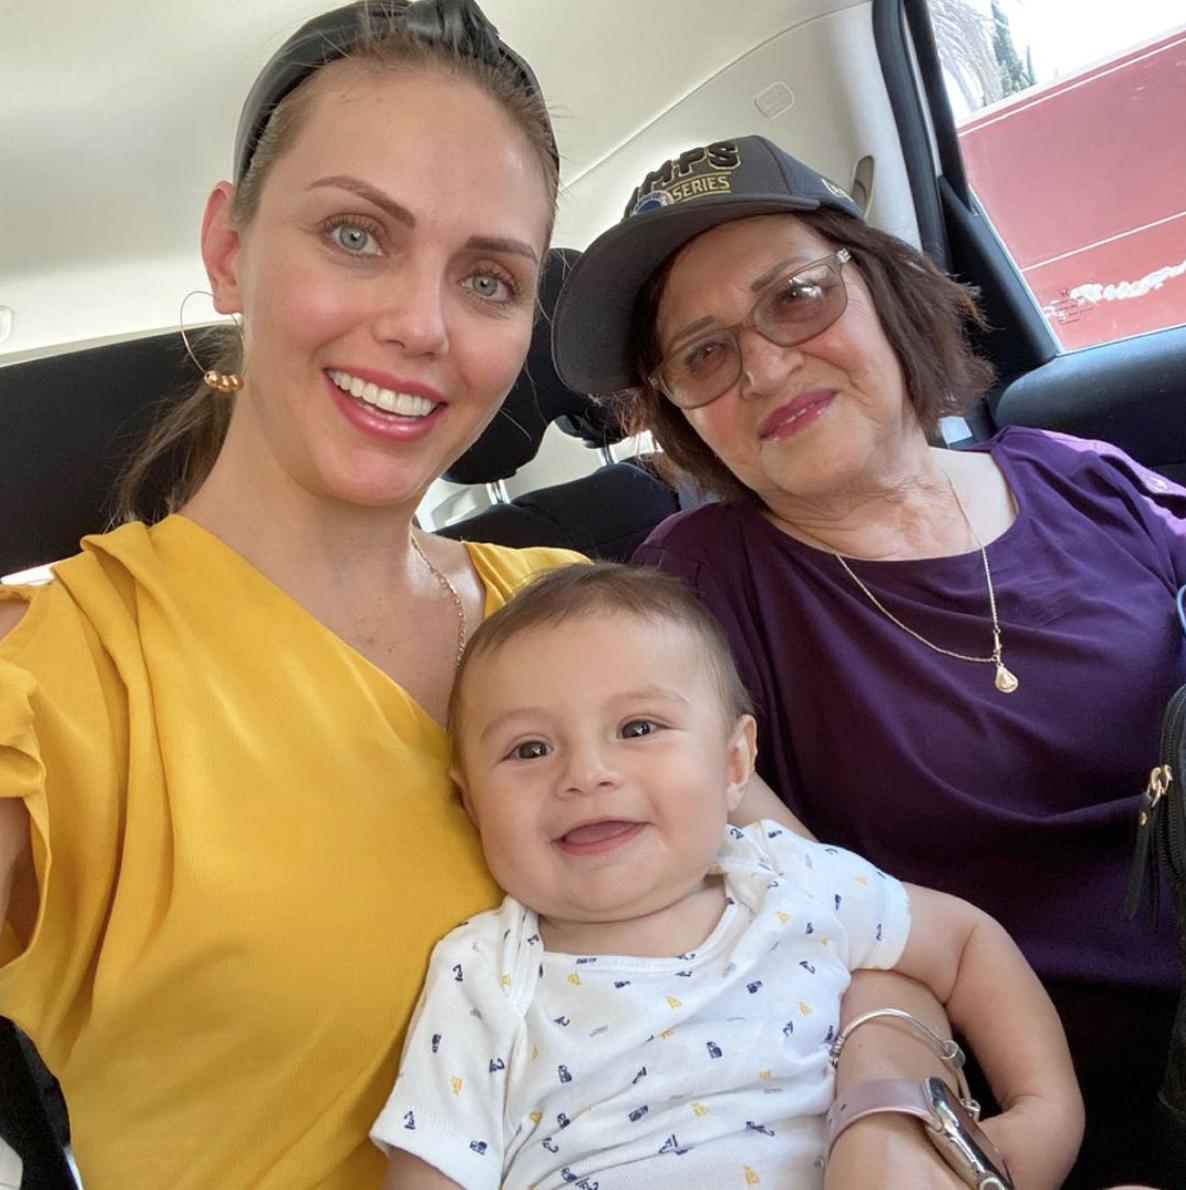 jessica carrillo dia de las madres 2021